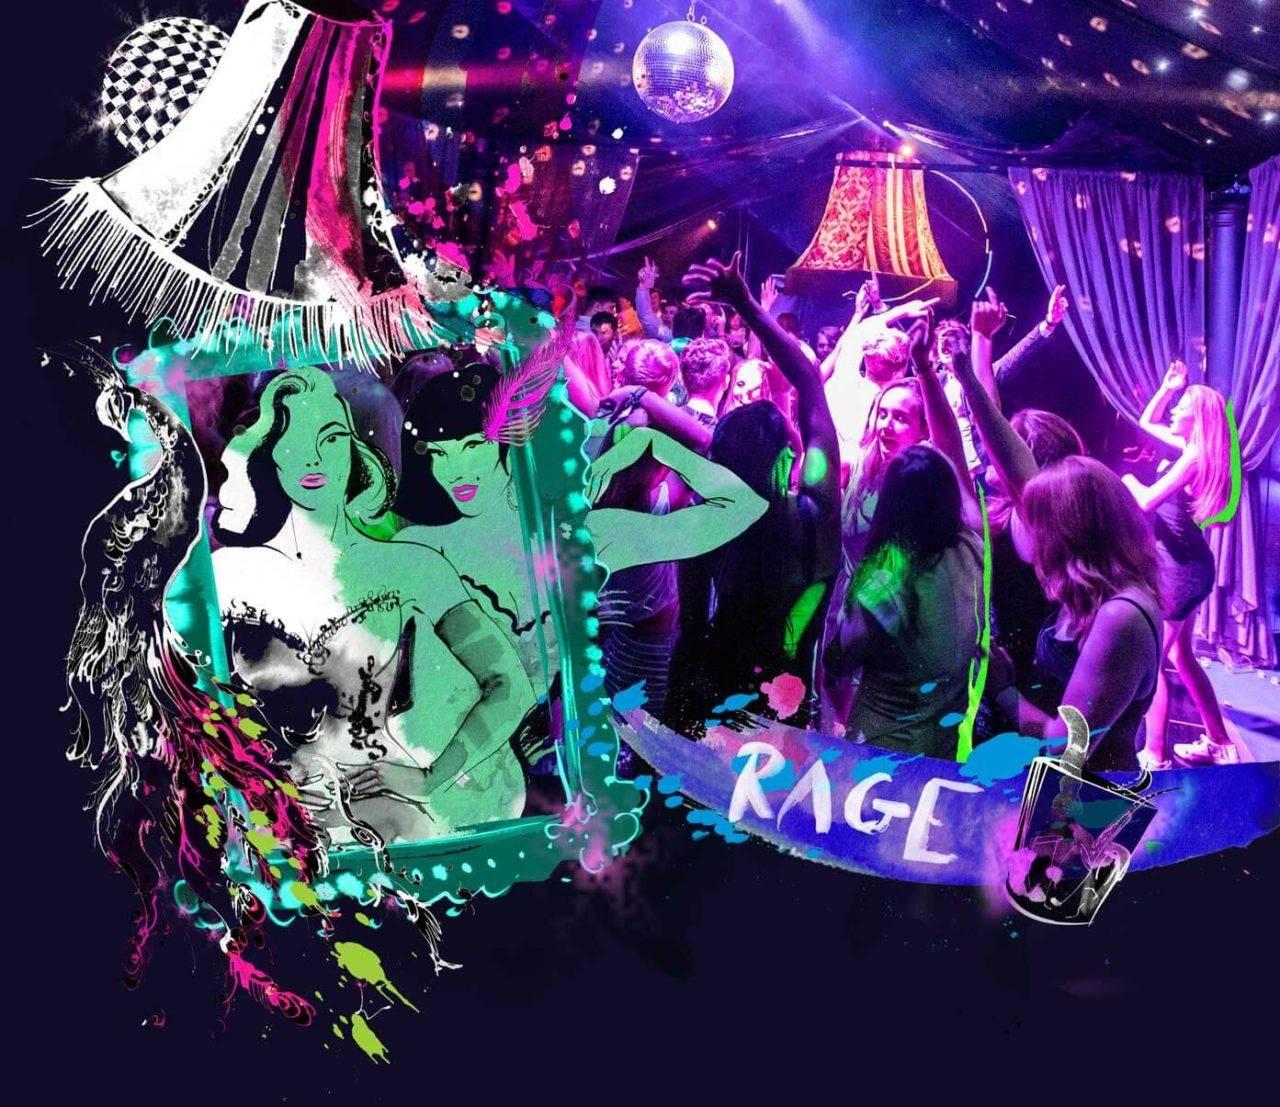 Rage Pop Up Nightclub Illustration